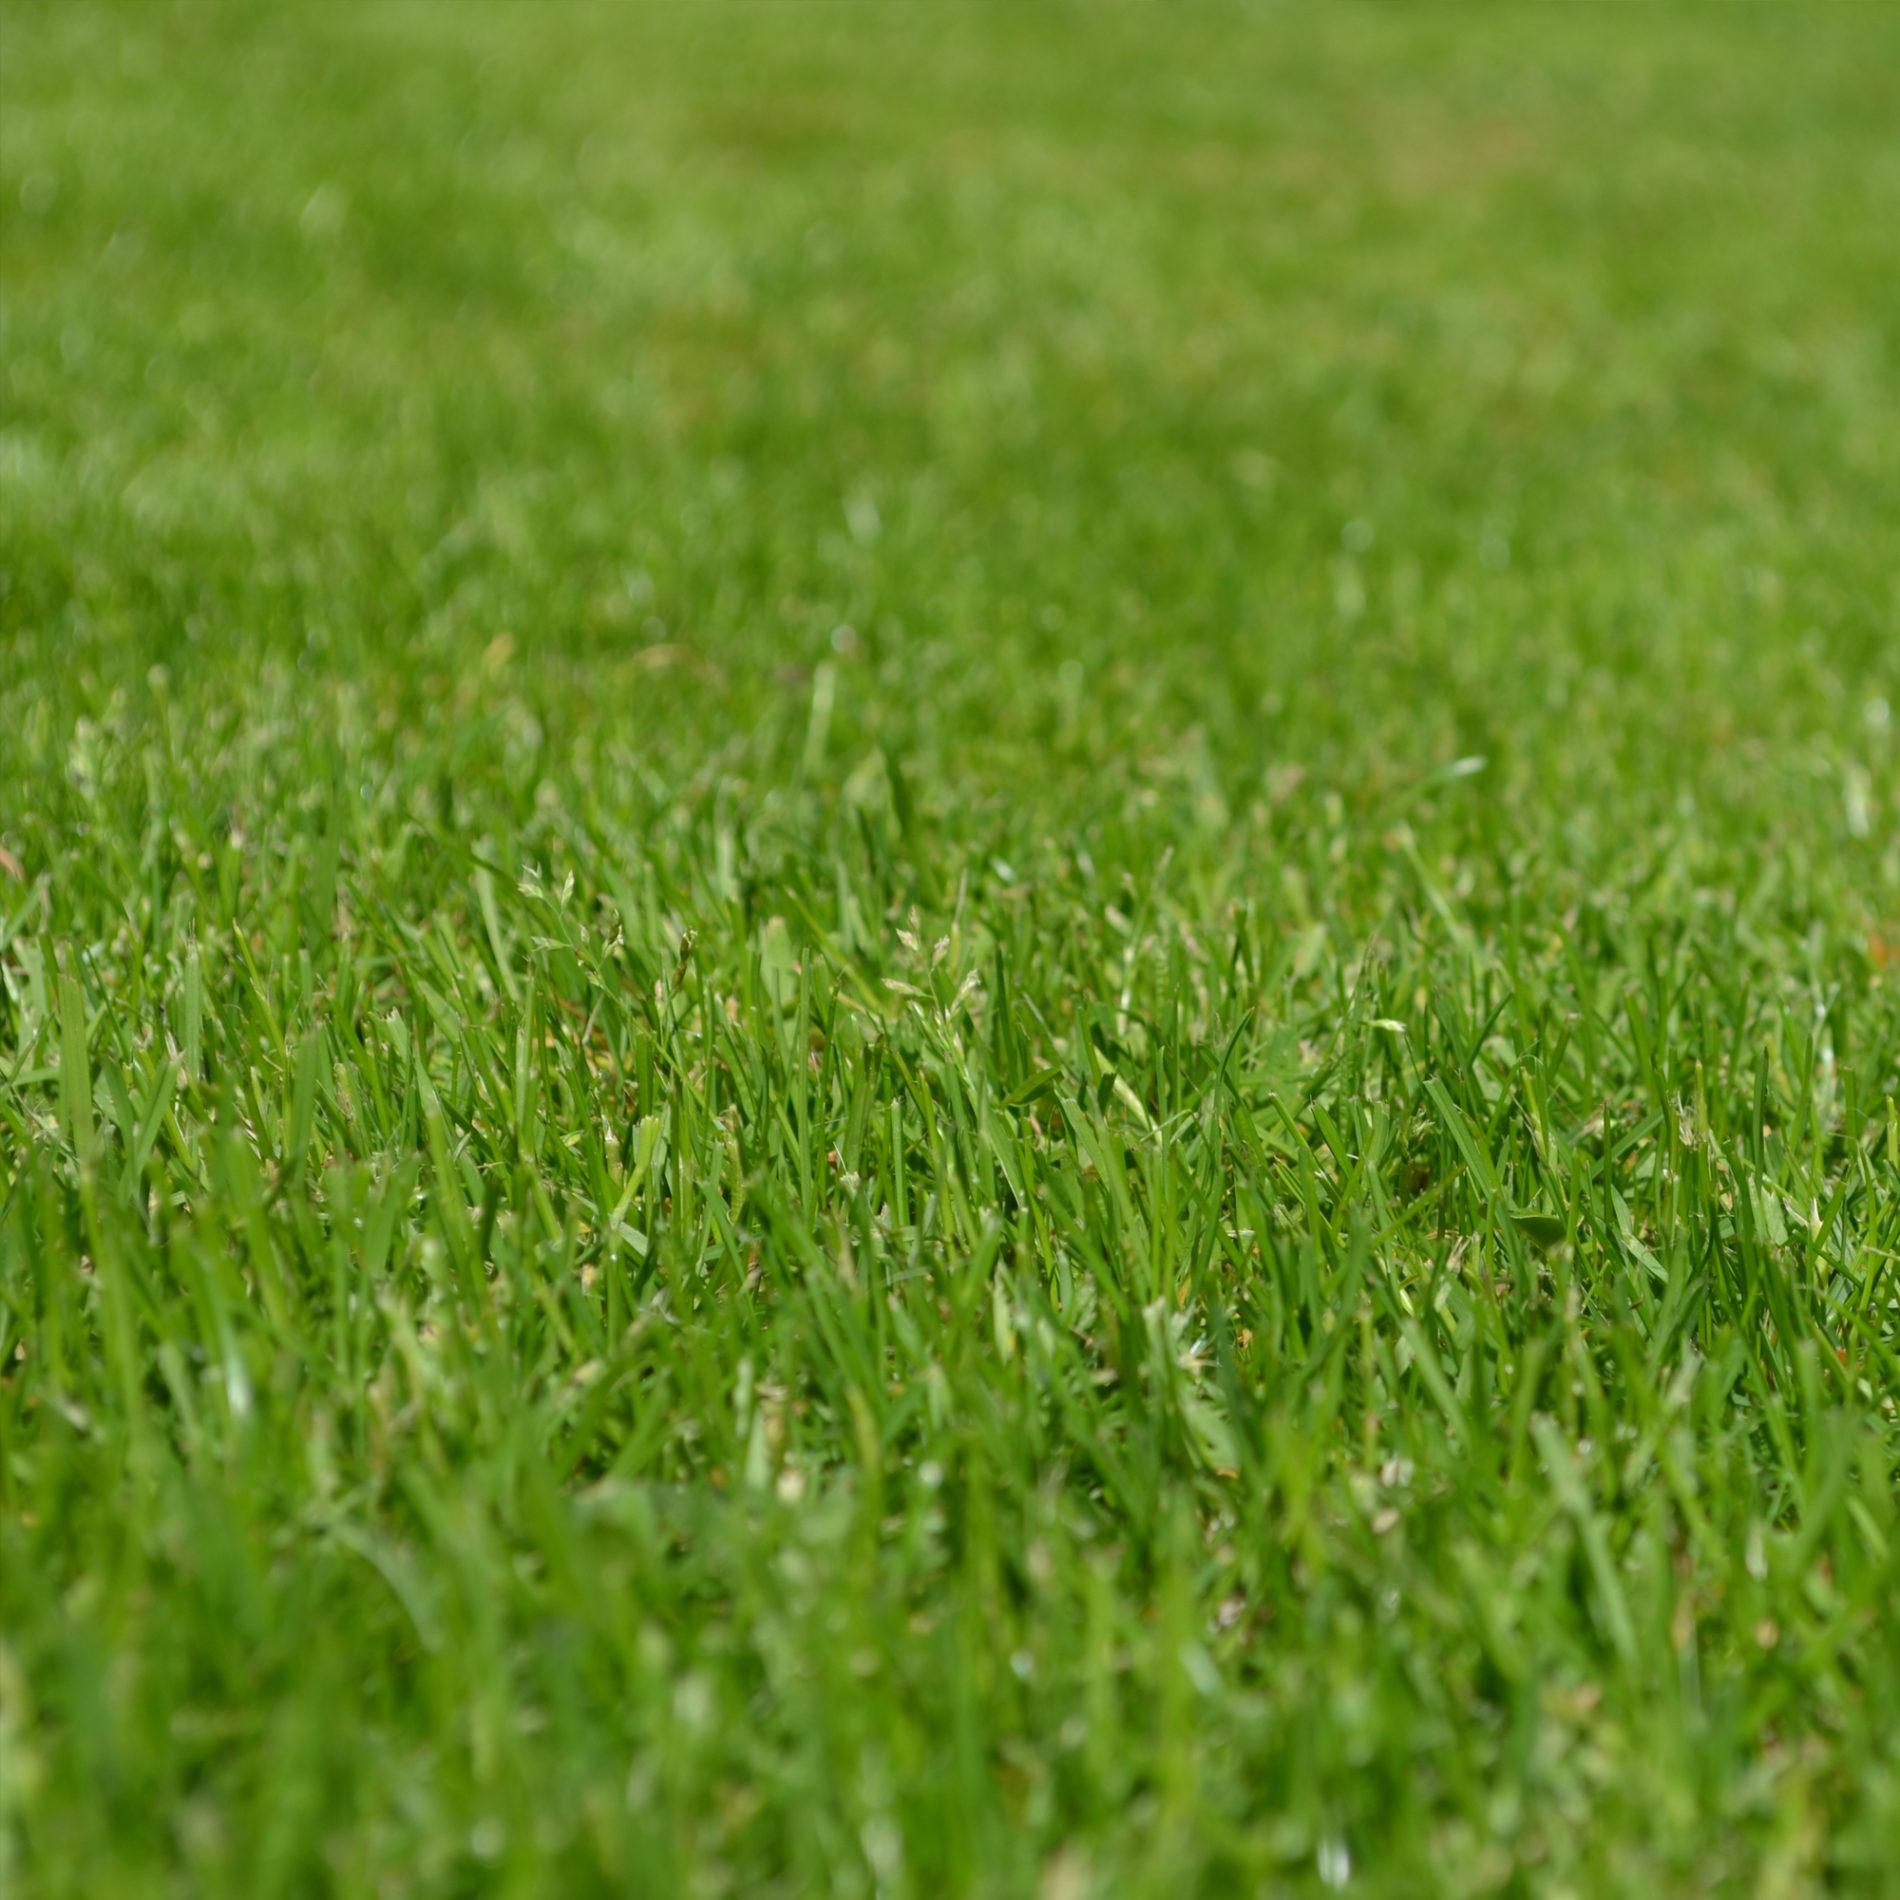 Proposte innovative per spazi verdi a ridotta manutenzione